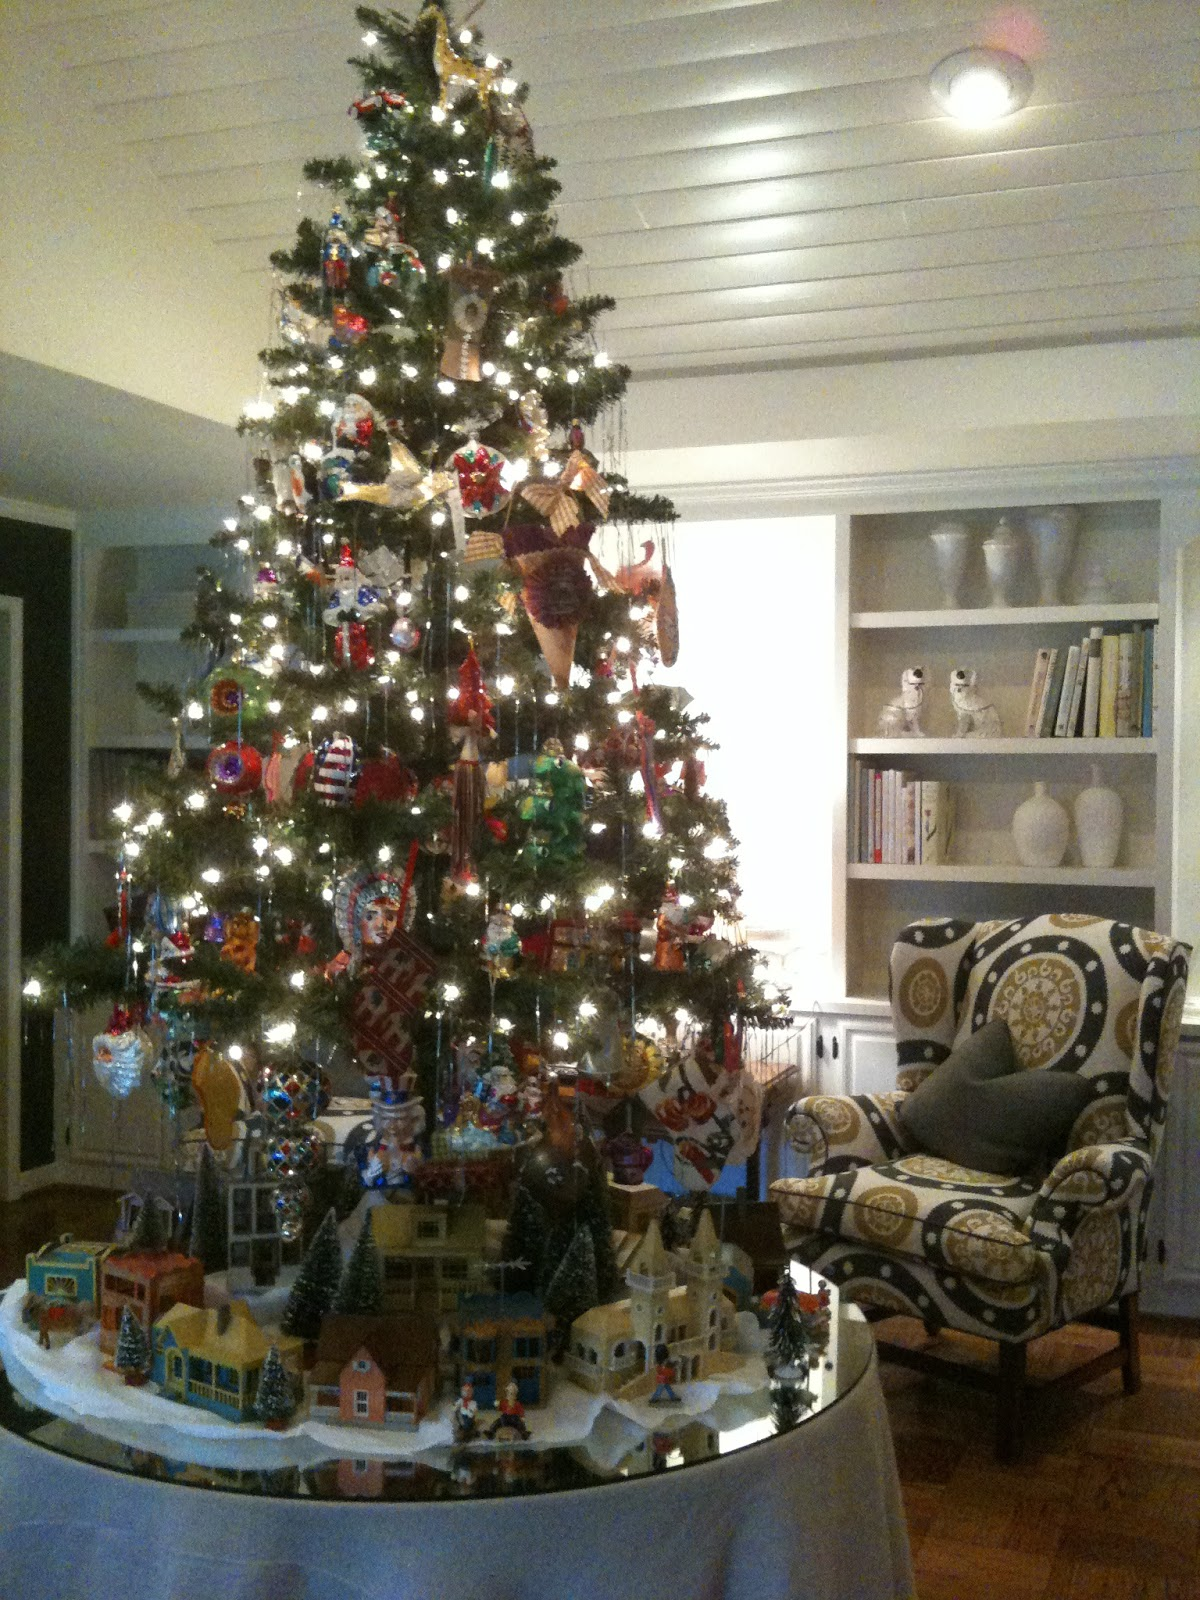 Christmas Decorated House San Francisco : Christmas at my house part the tree and san francisco